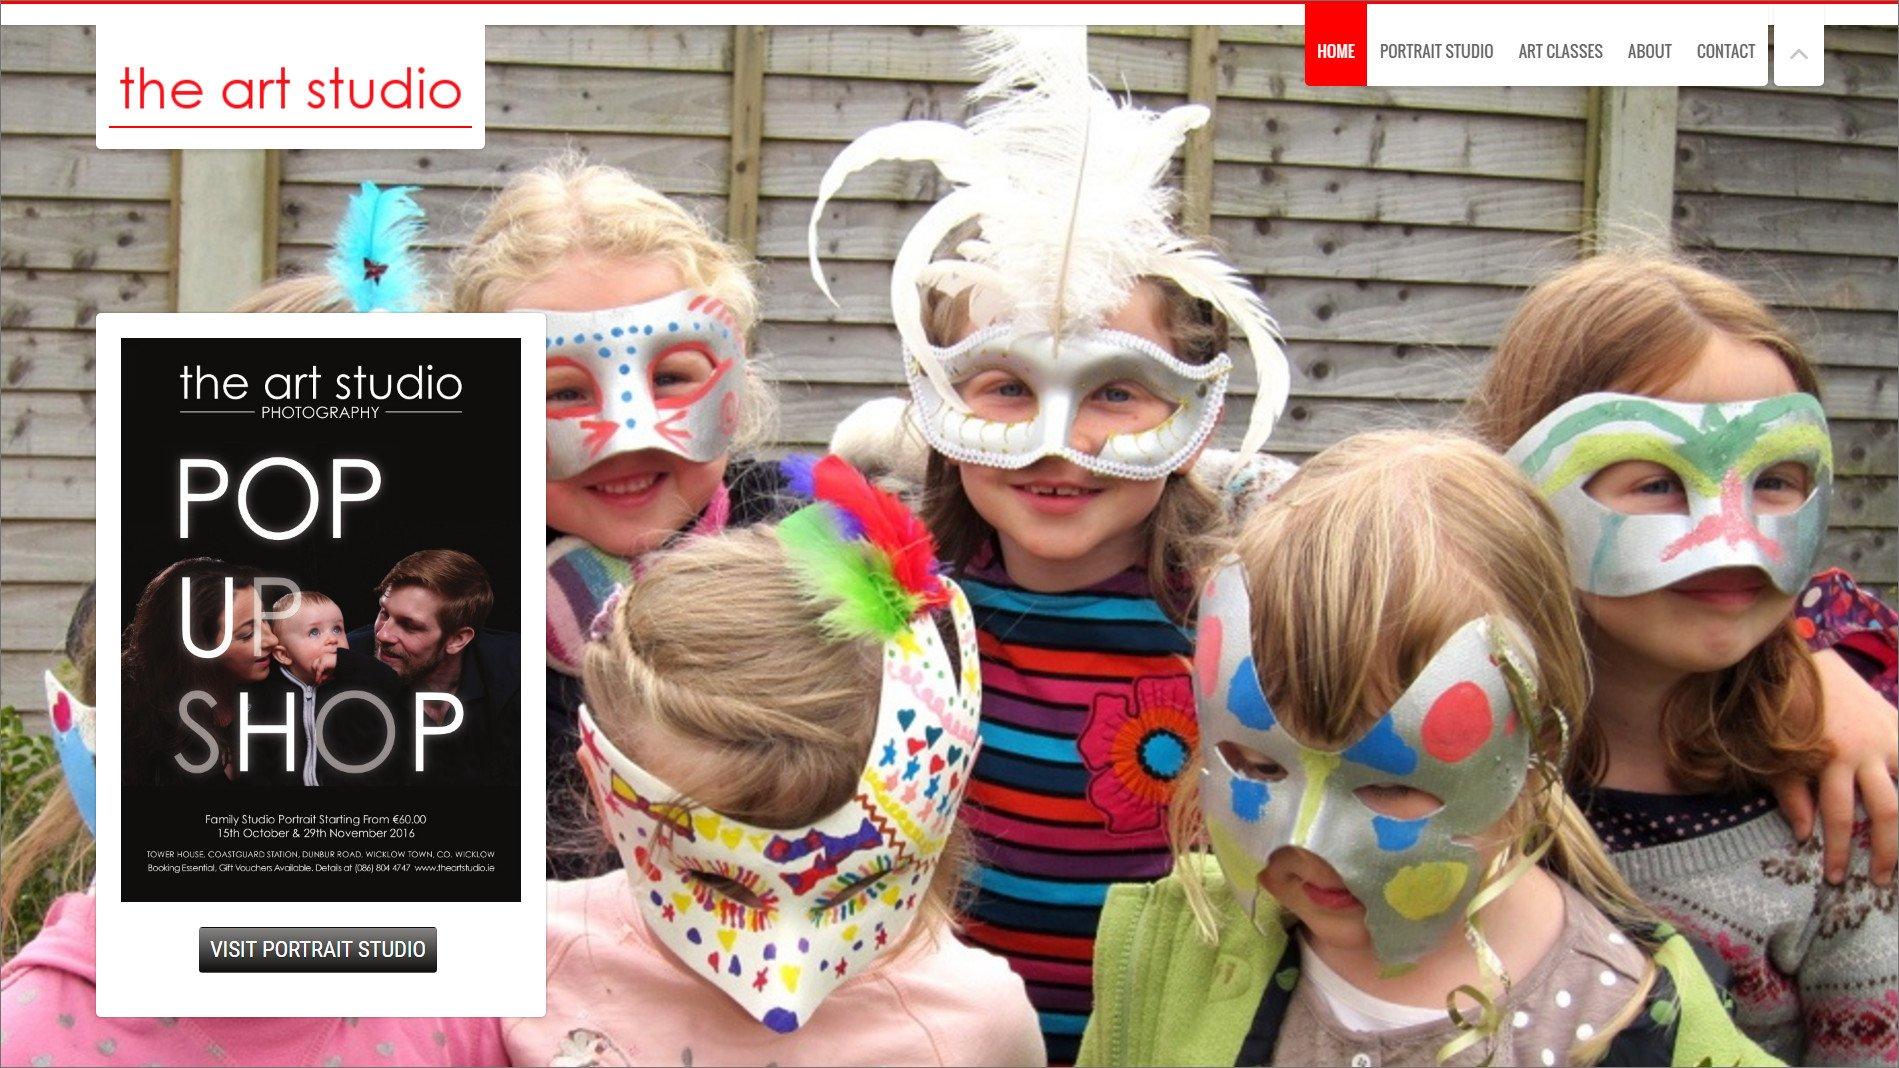 Website design for The Art Studio design by Ridge Design Home Page visual